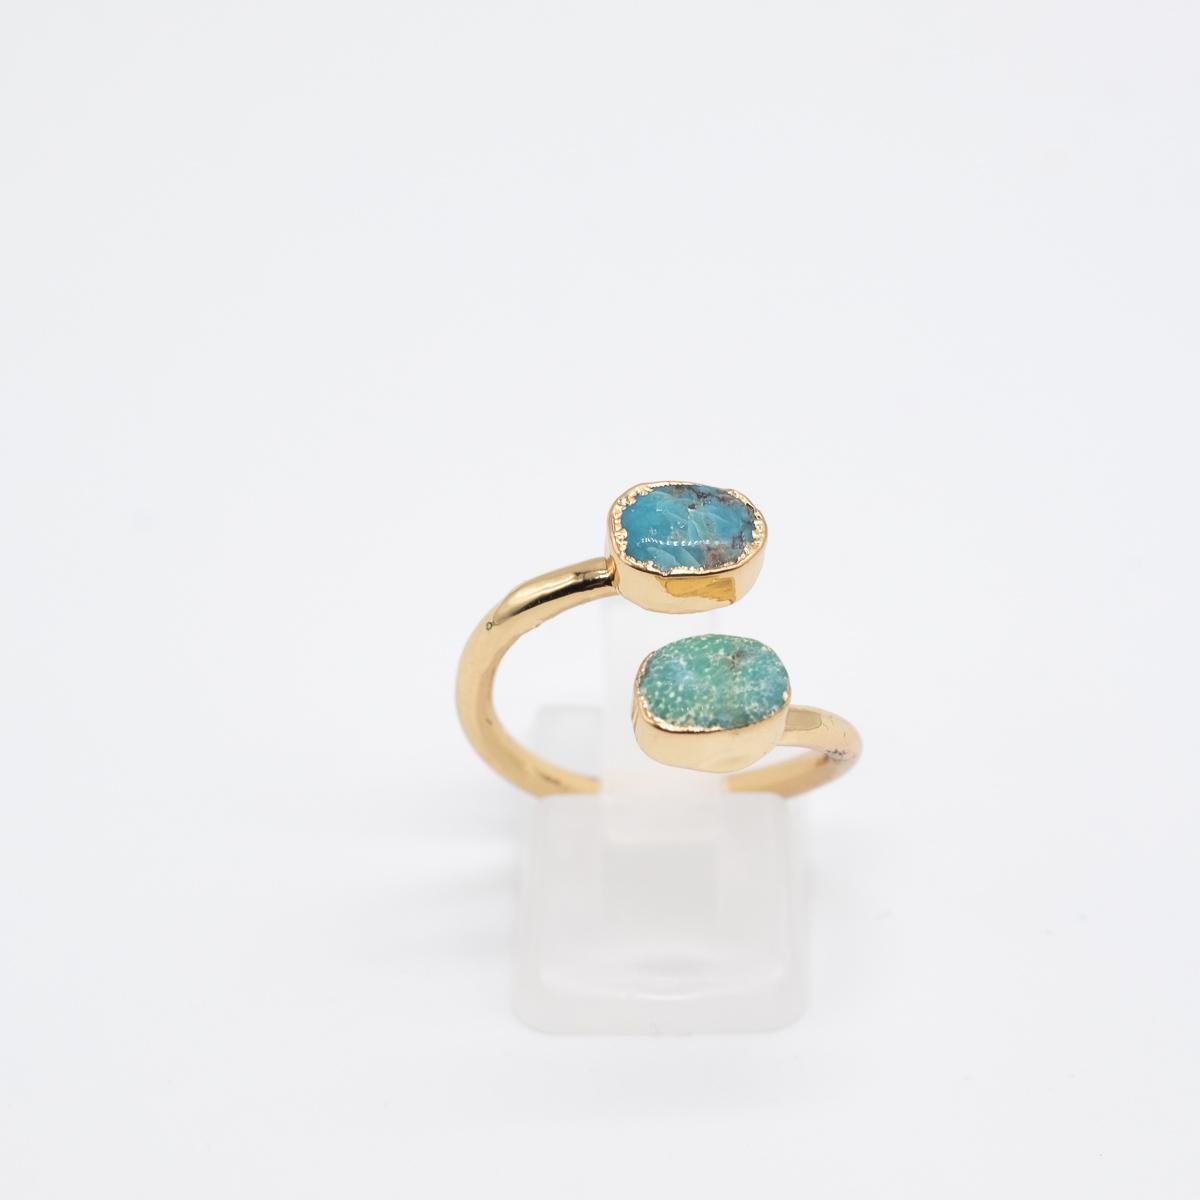 RNG-010 ring tukoois blauw groen